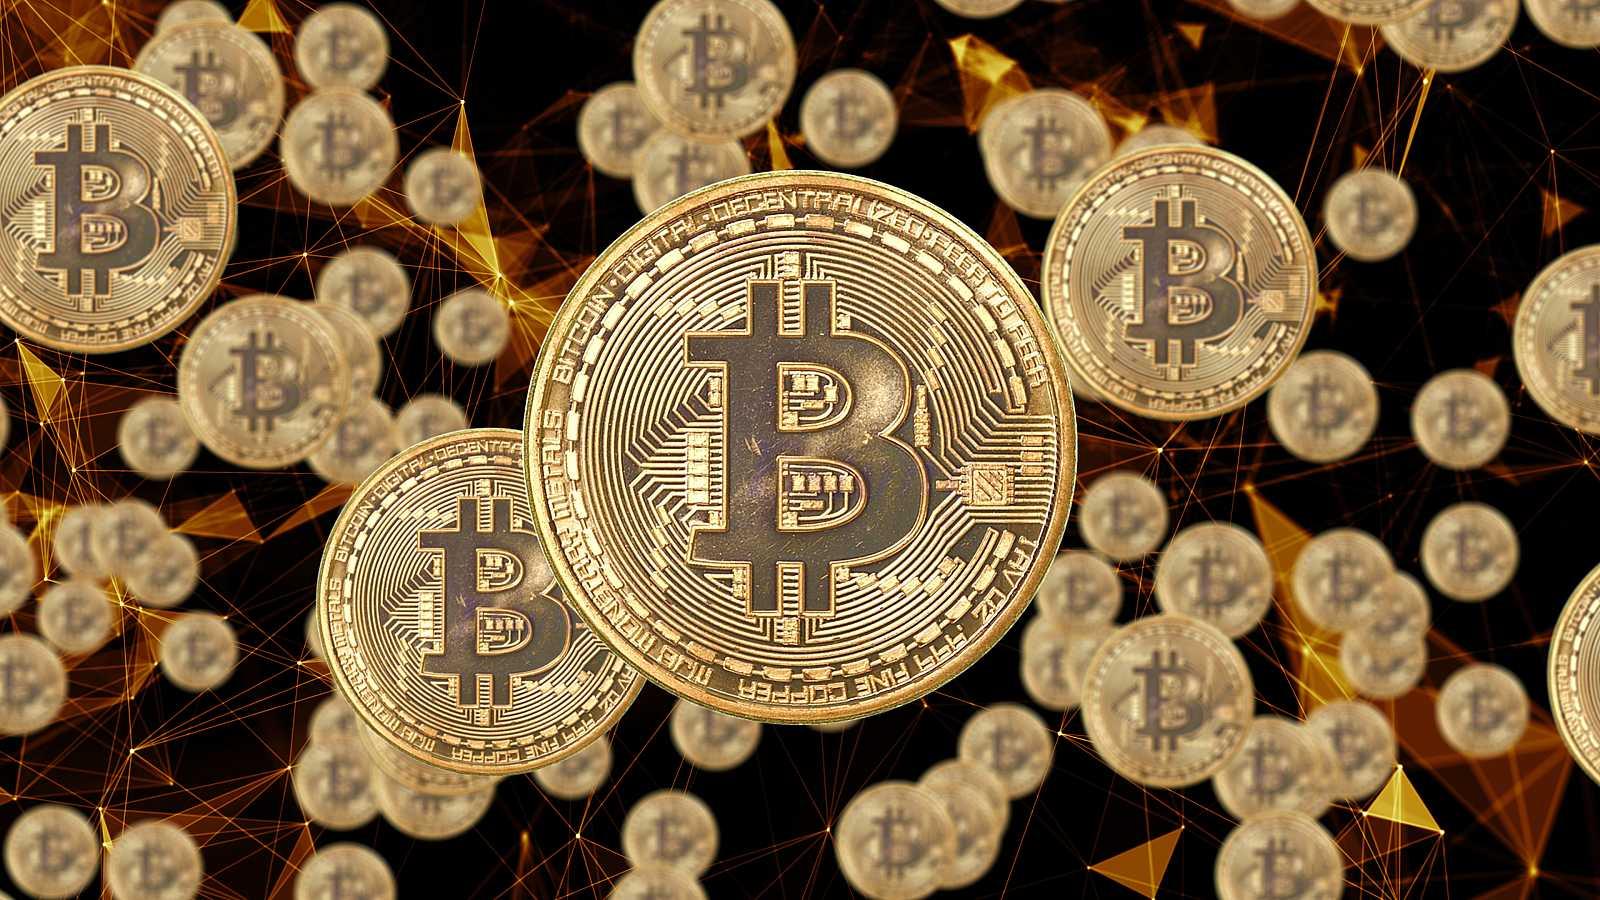 Marca España - ¿Funcionan los bitcoins en España? - 15/03/18 - Escuchar ahora